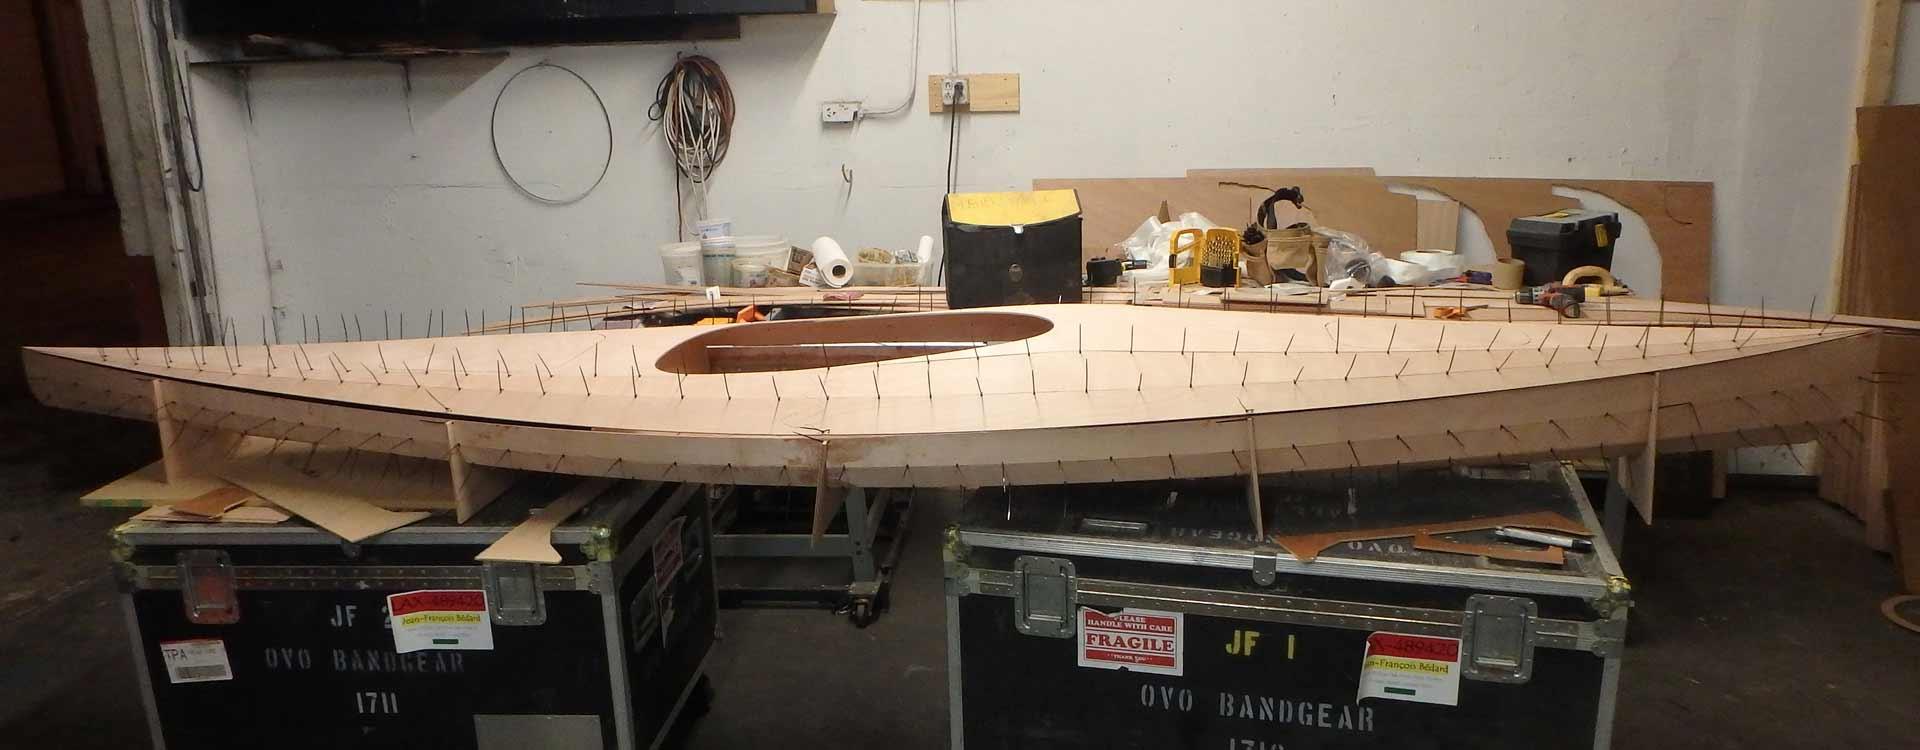 Sit in stitch anglue glue kayak kit